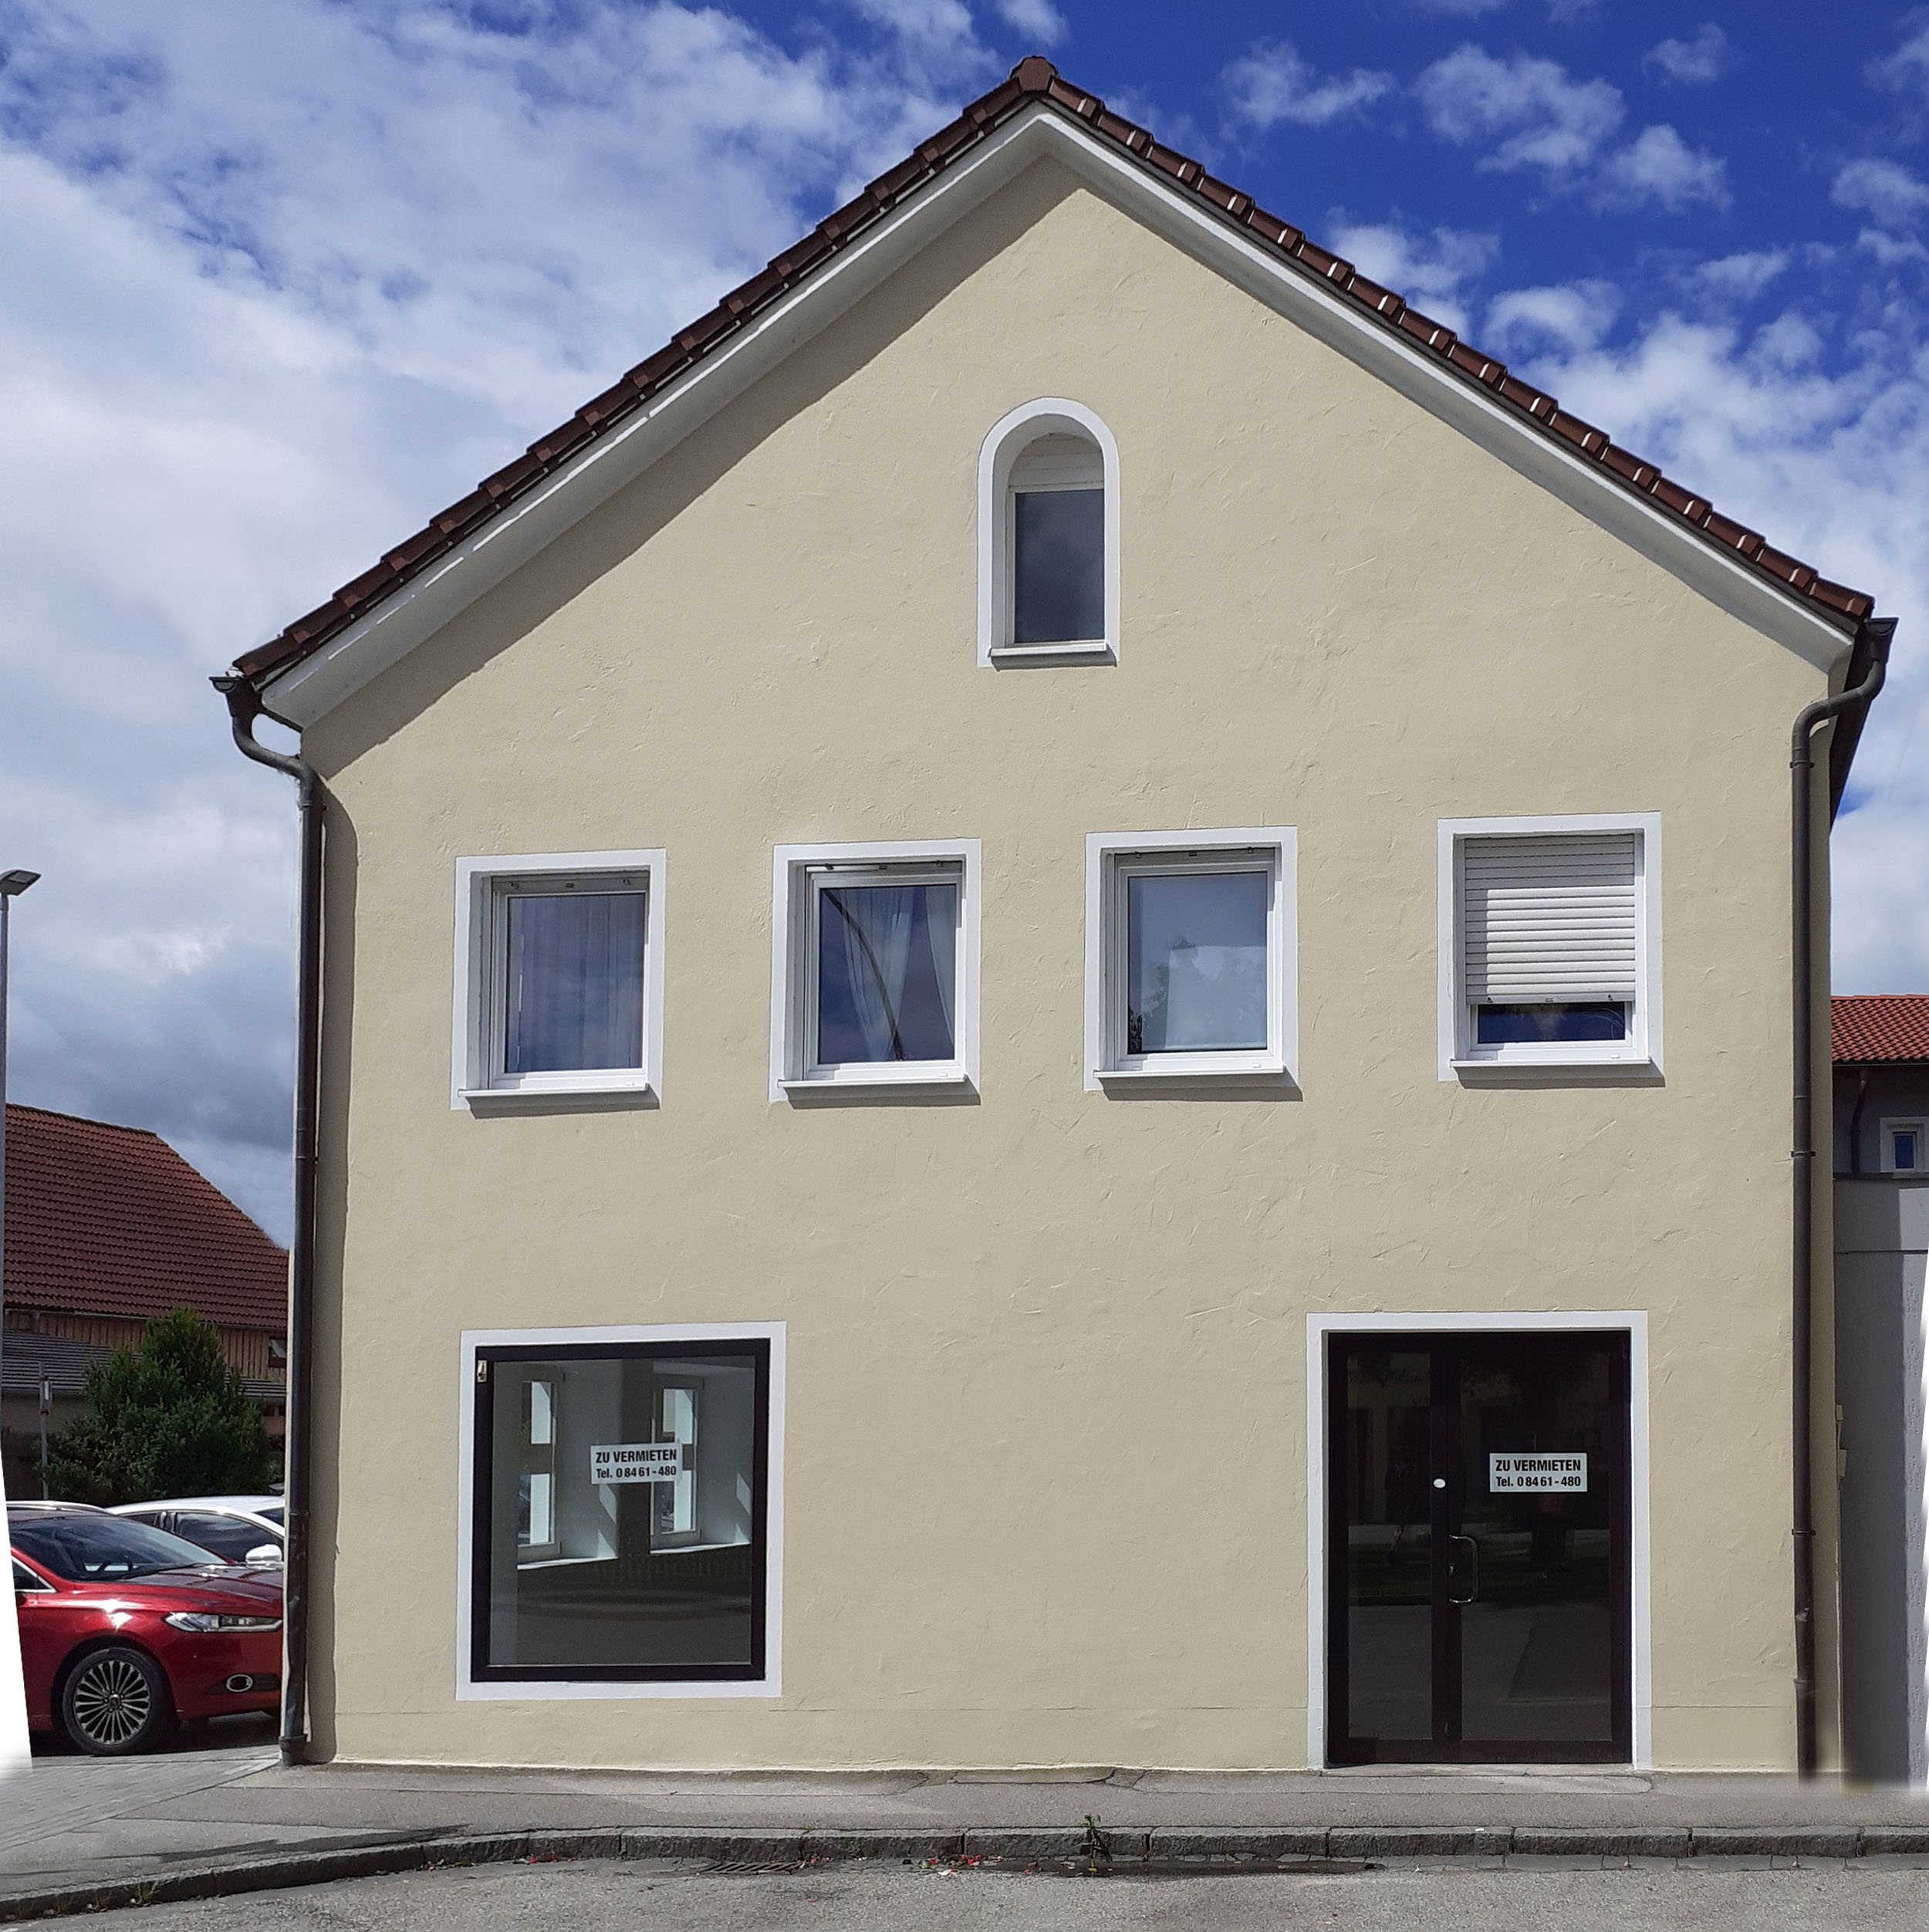 Leerstand Gewerbeimmobilie in der Ringstraße Beilngries